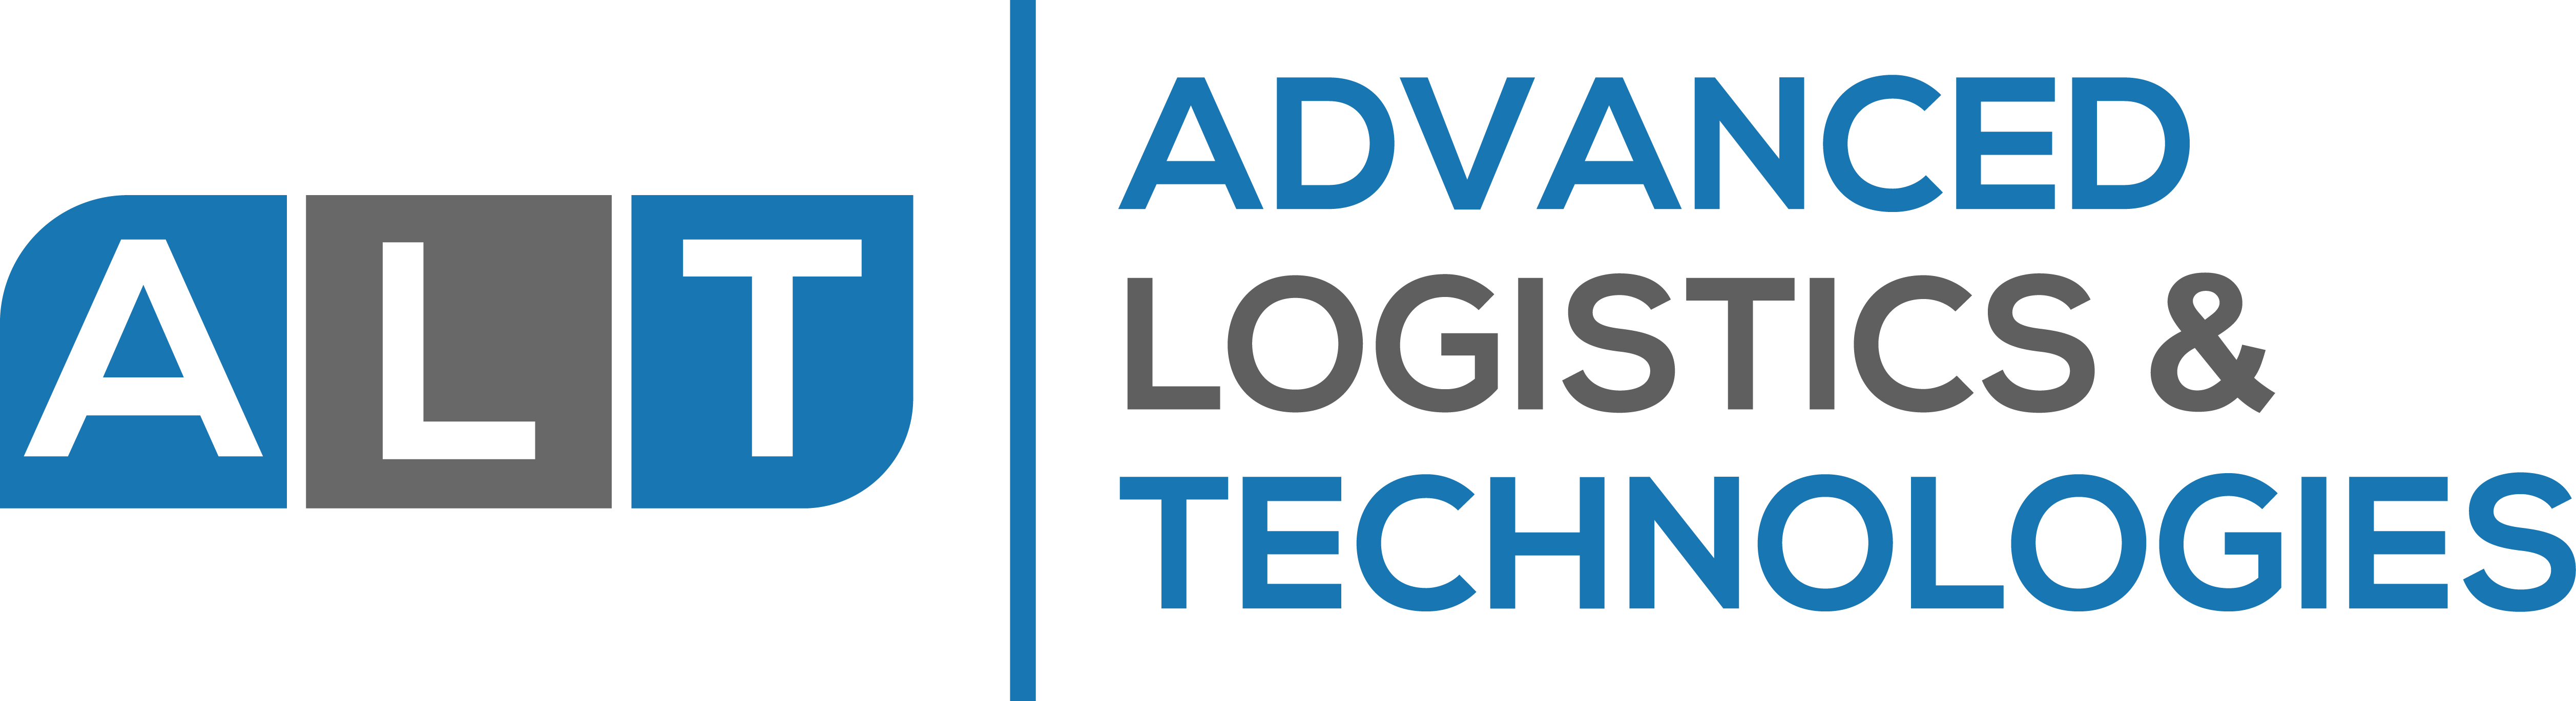 Advanced Logistics & Technologies